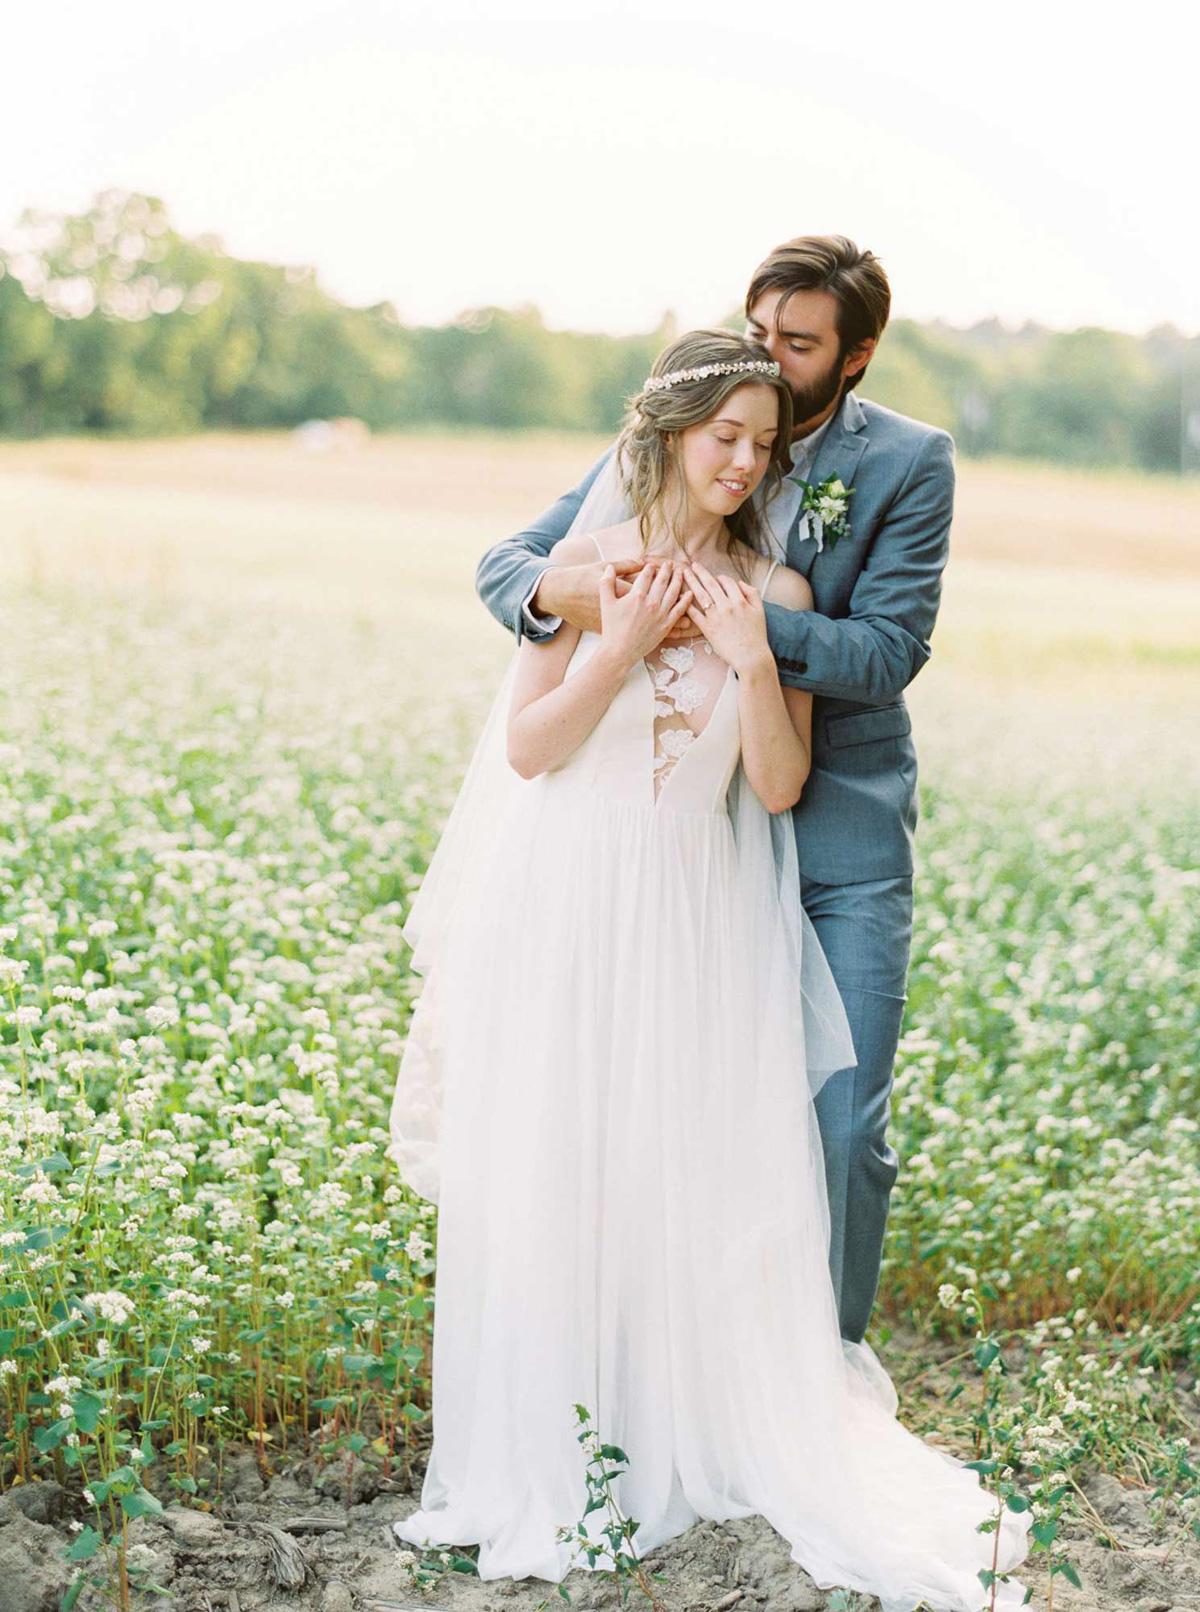 kayla-yestal-vineyard-bride-swish-list-woodland-weddings-niagara-wedding-editorial-32.jpg